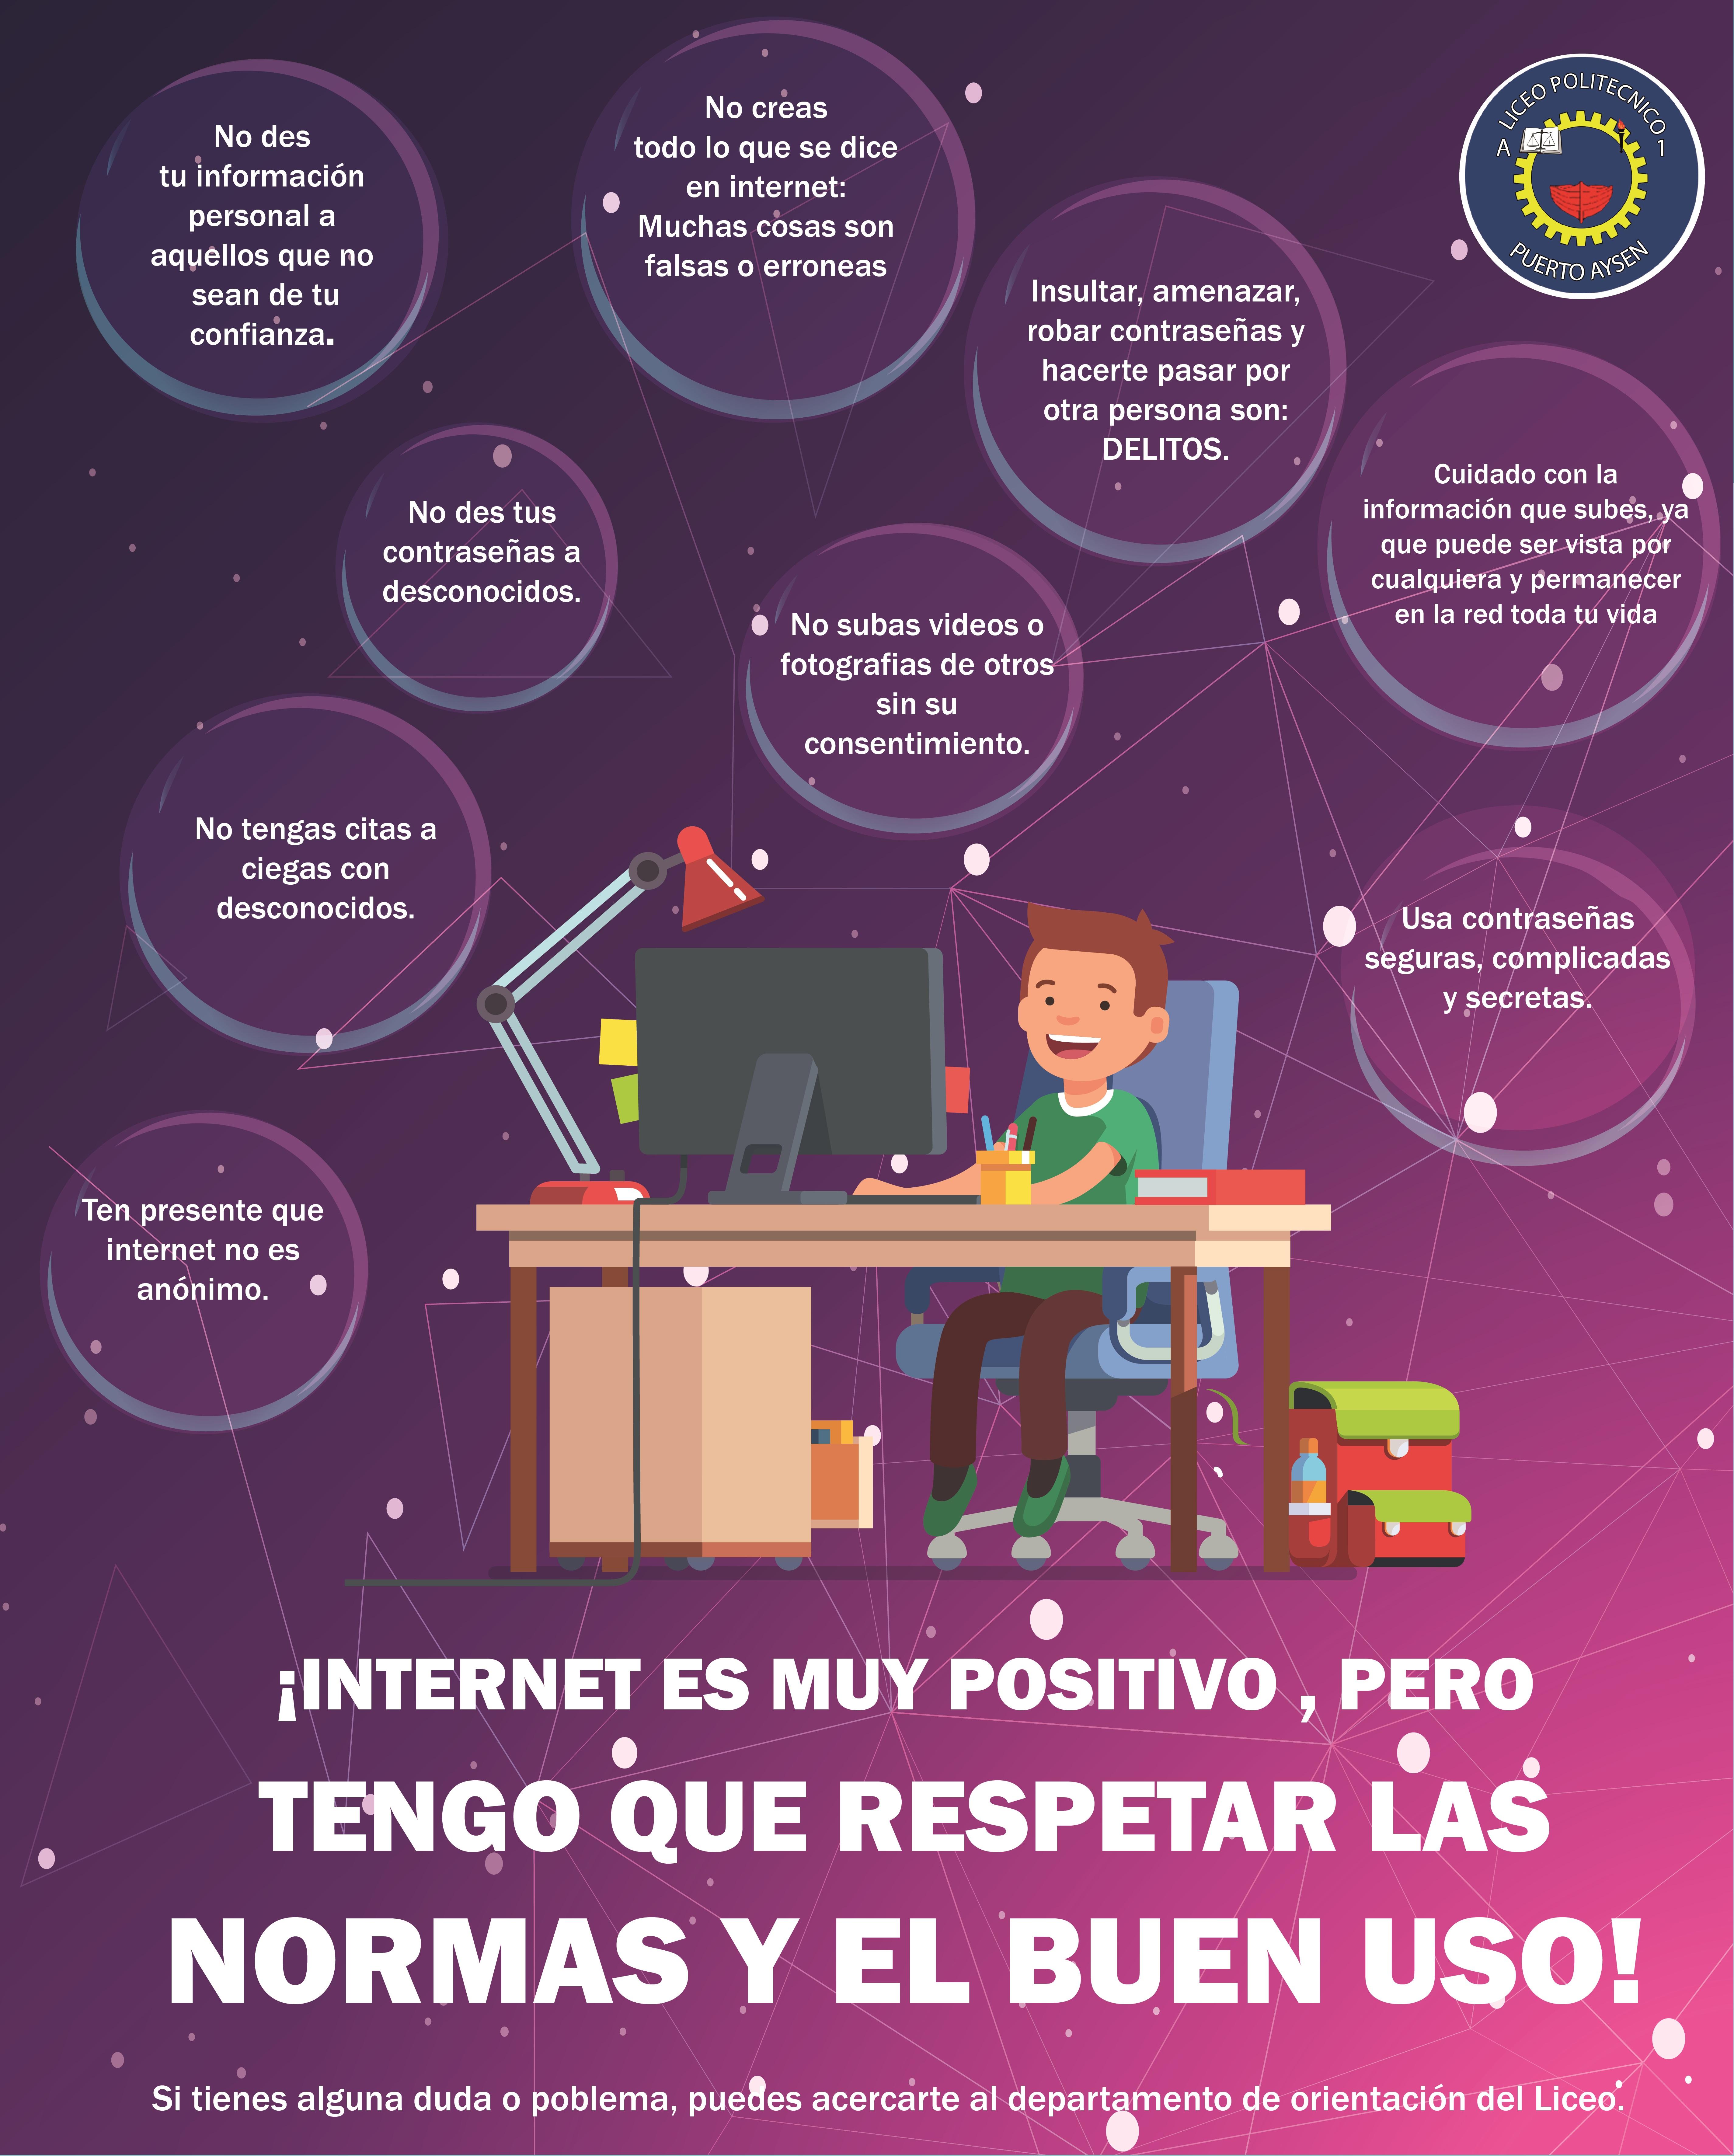 Uso seguro de la Internet